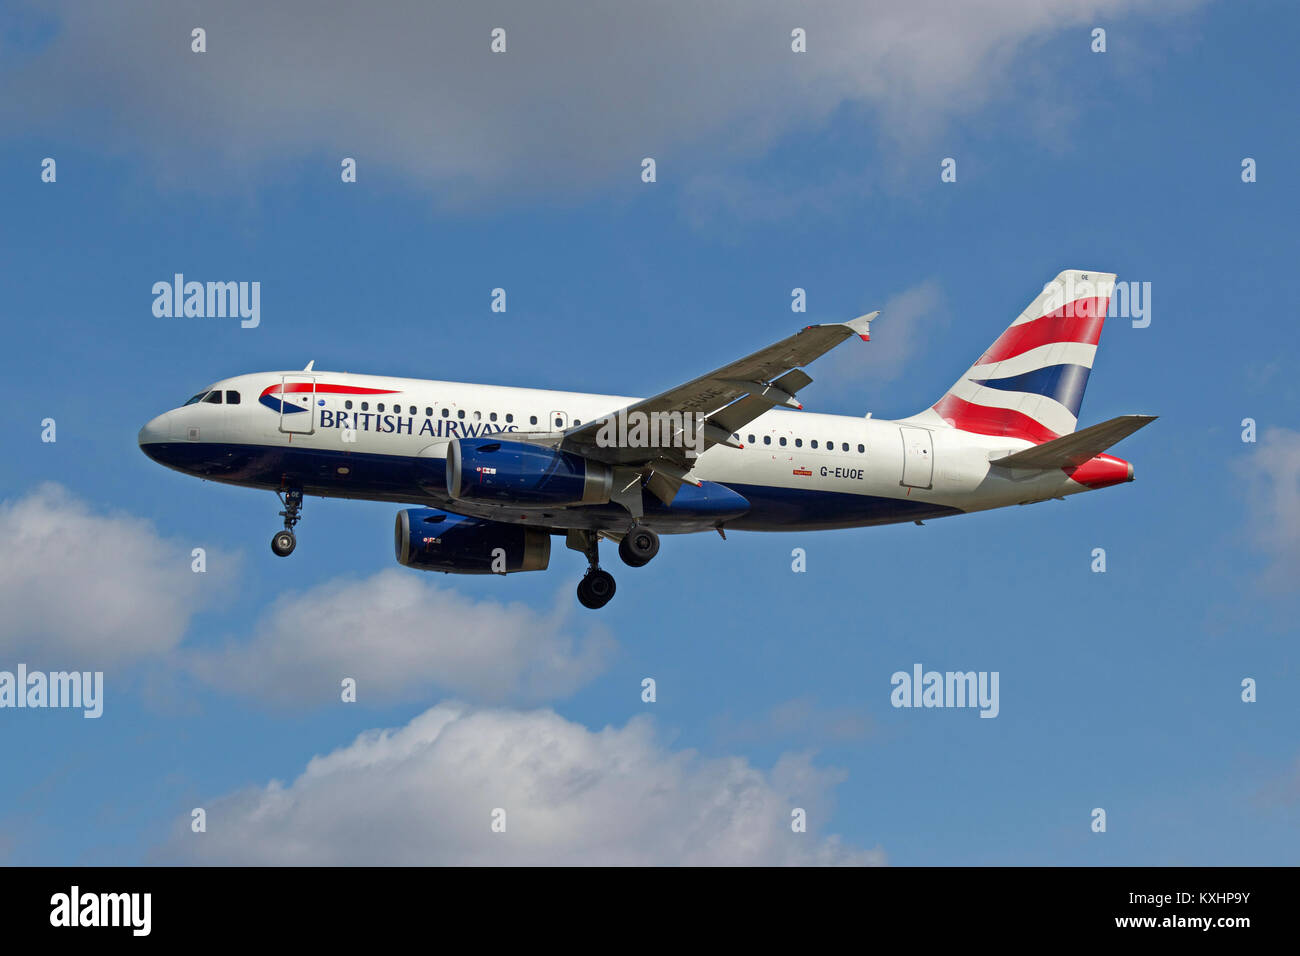 British Airways Airbus A319-131 G-EUOE landing at London Heathrow.Stock Photo